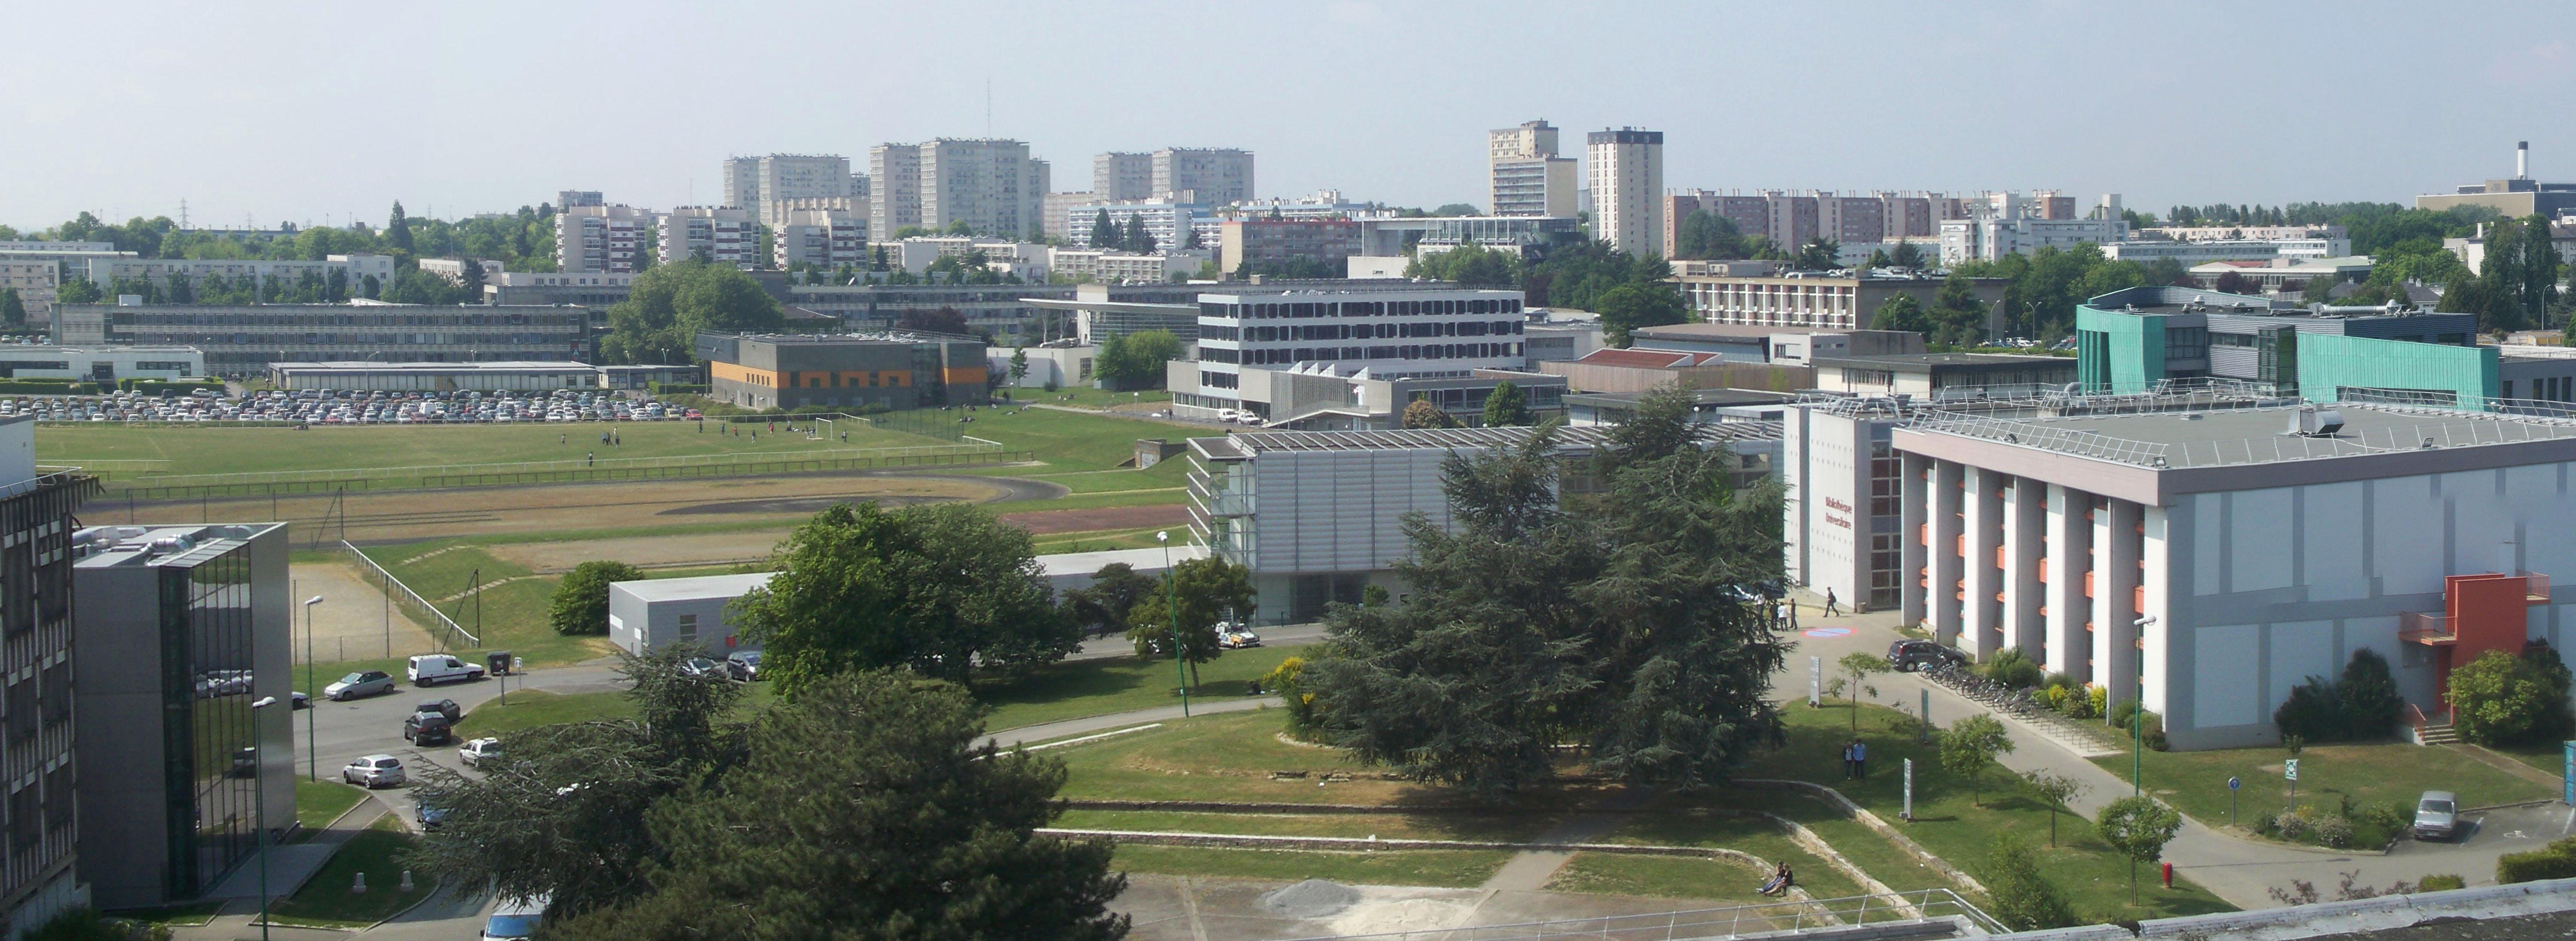 File campus de villejean wikimedia commons - Piscine villejean rennes ...